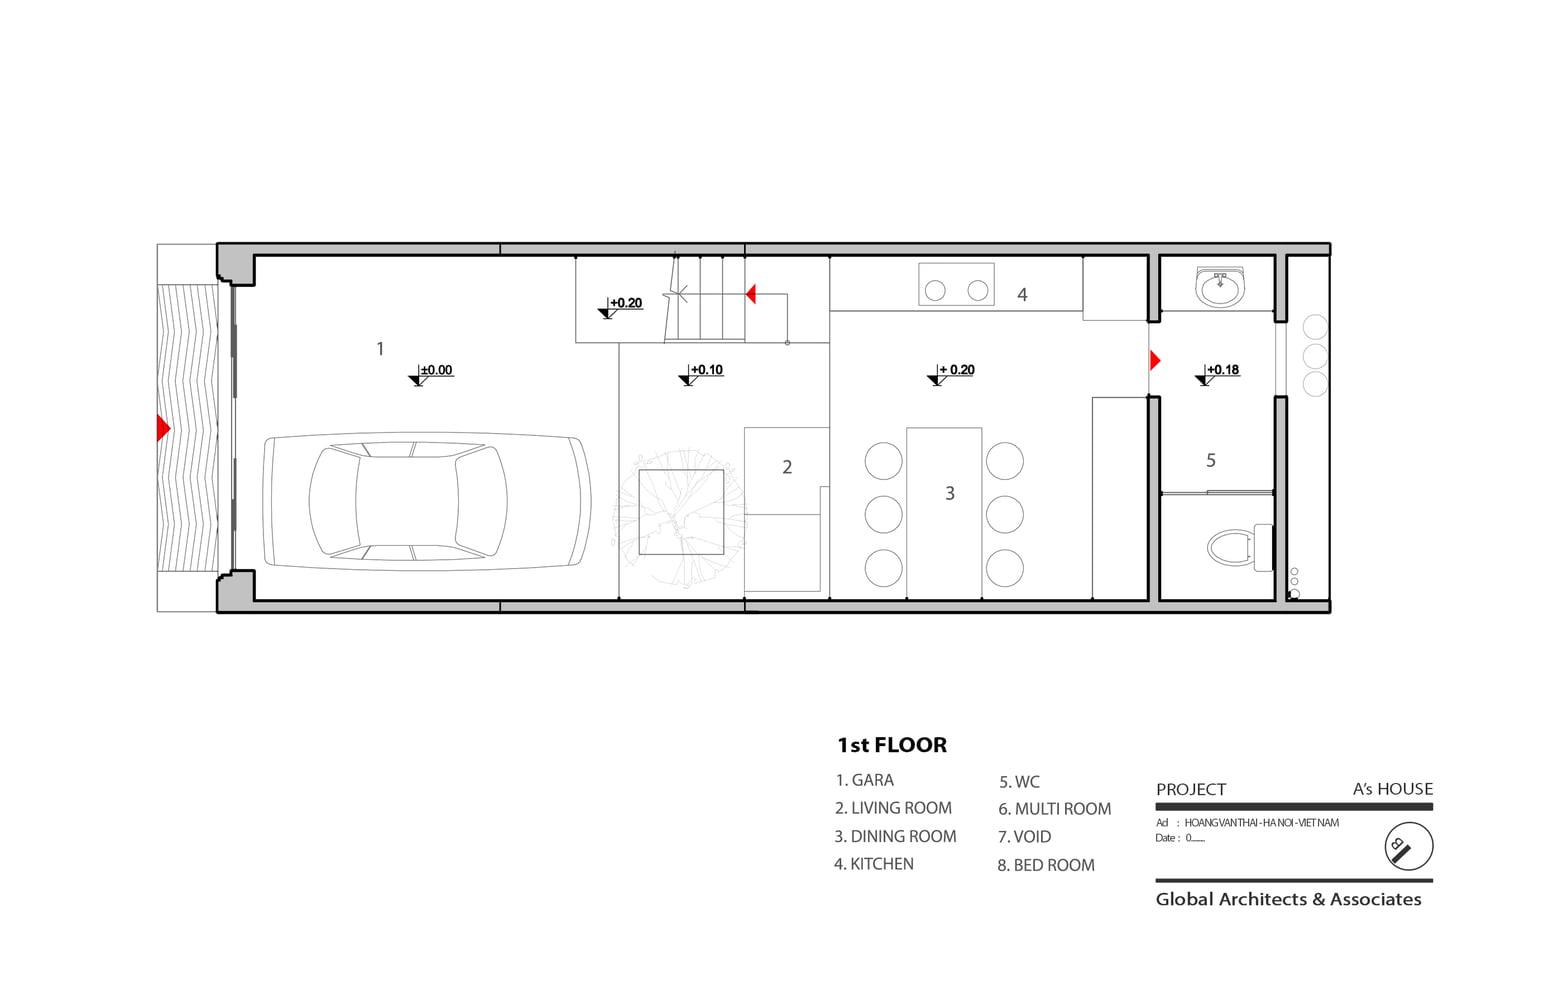 Plano del primer piso de la casa